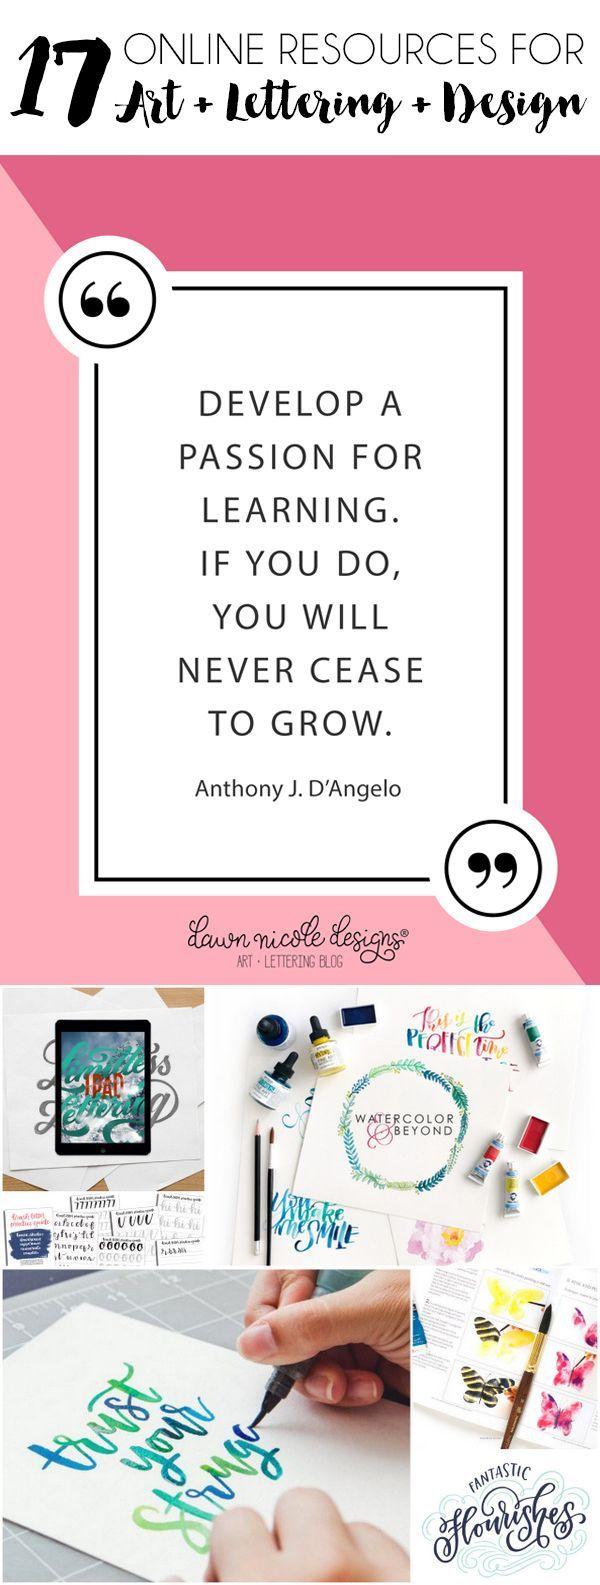 17 Online Resources for Learning Lettering, Art, + Design